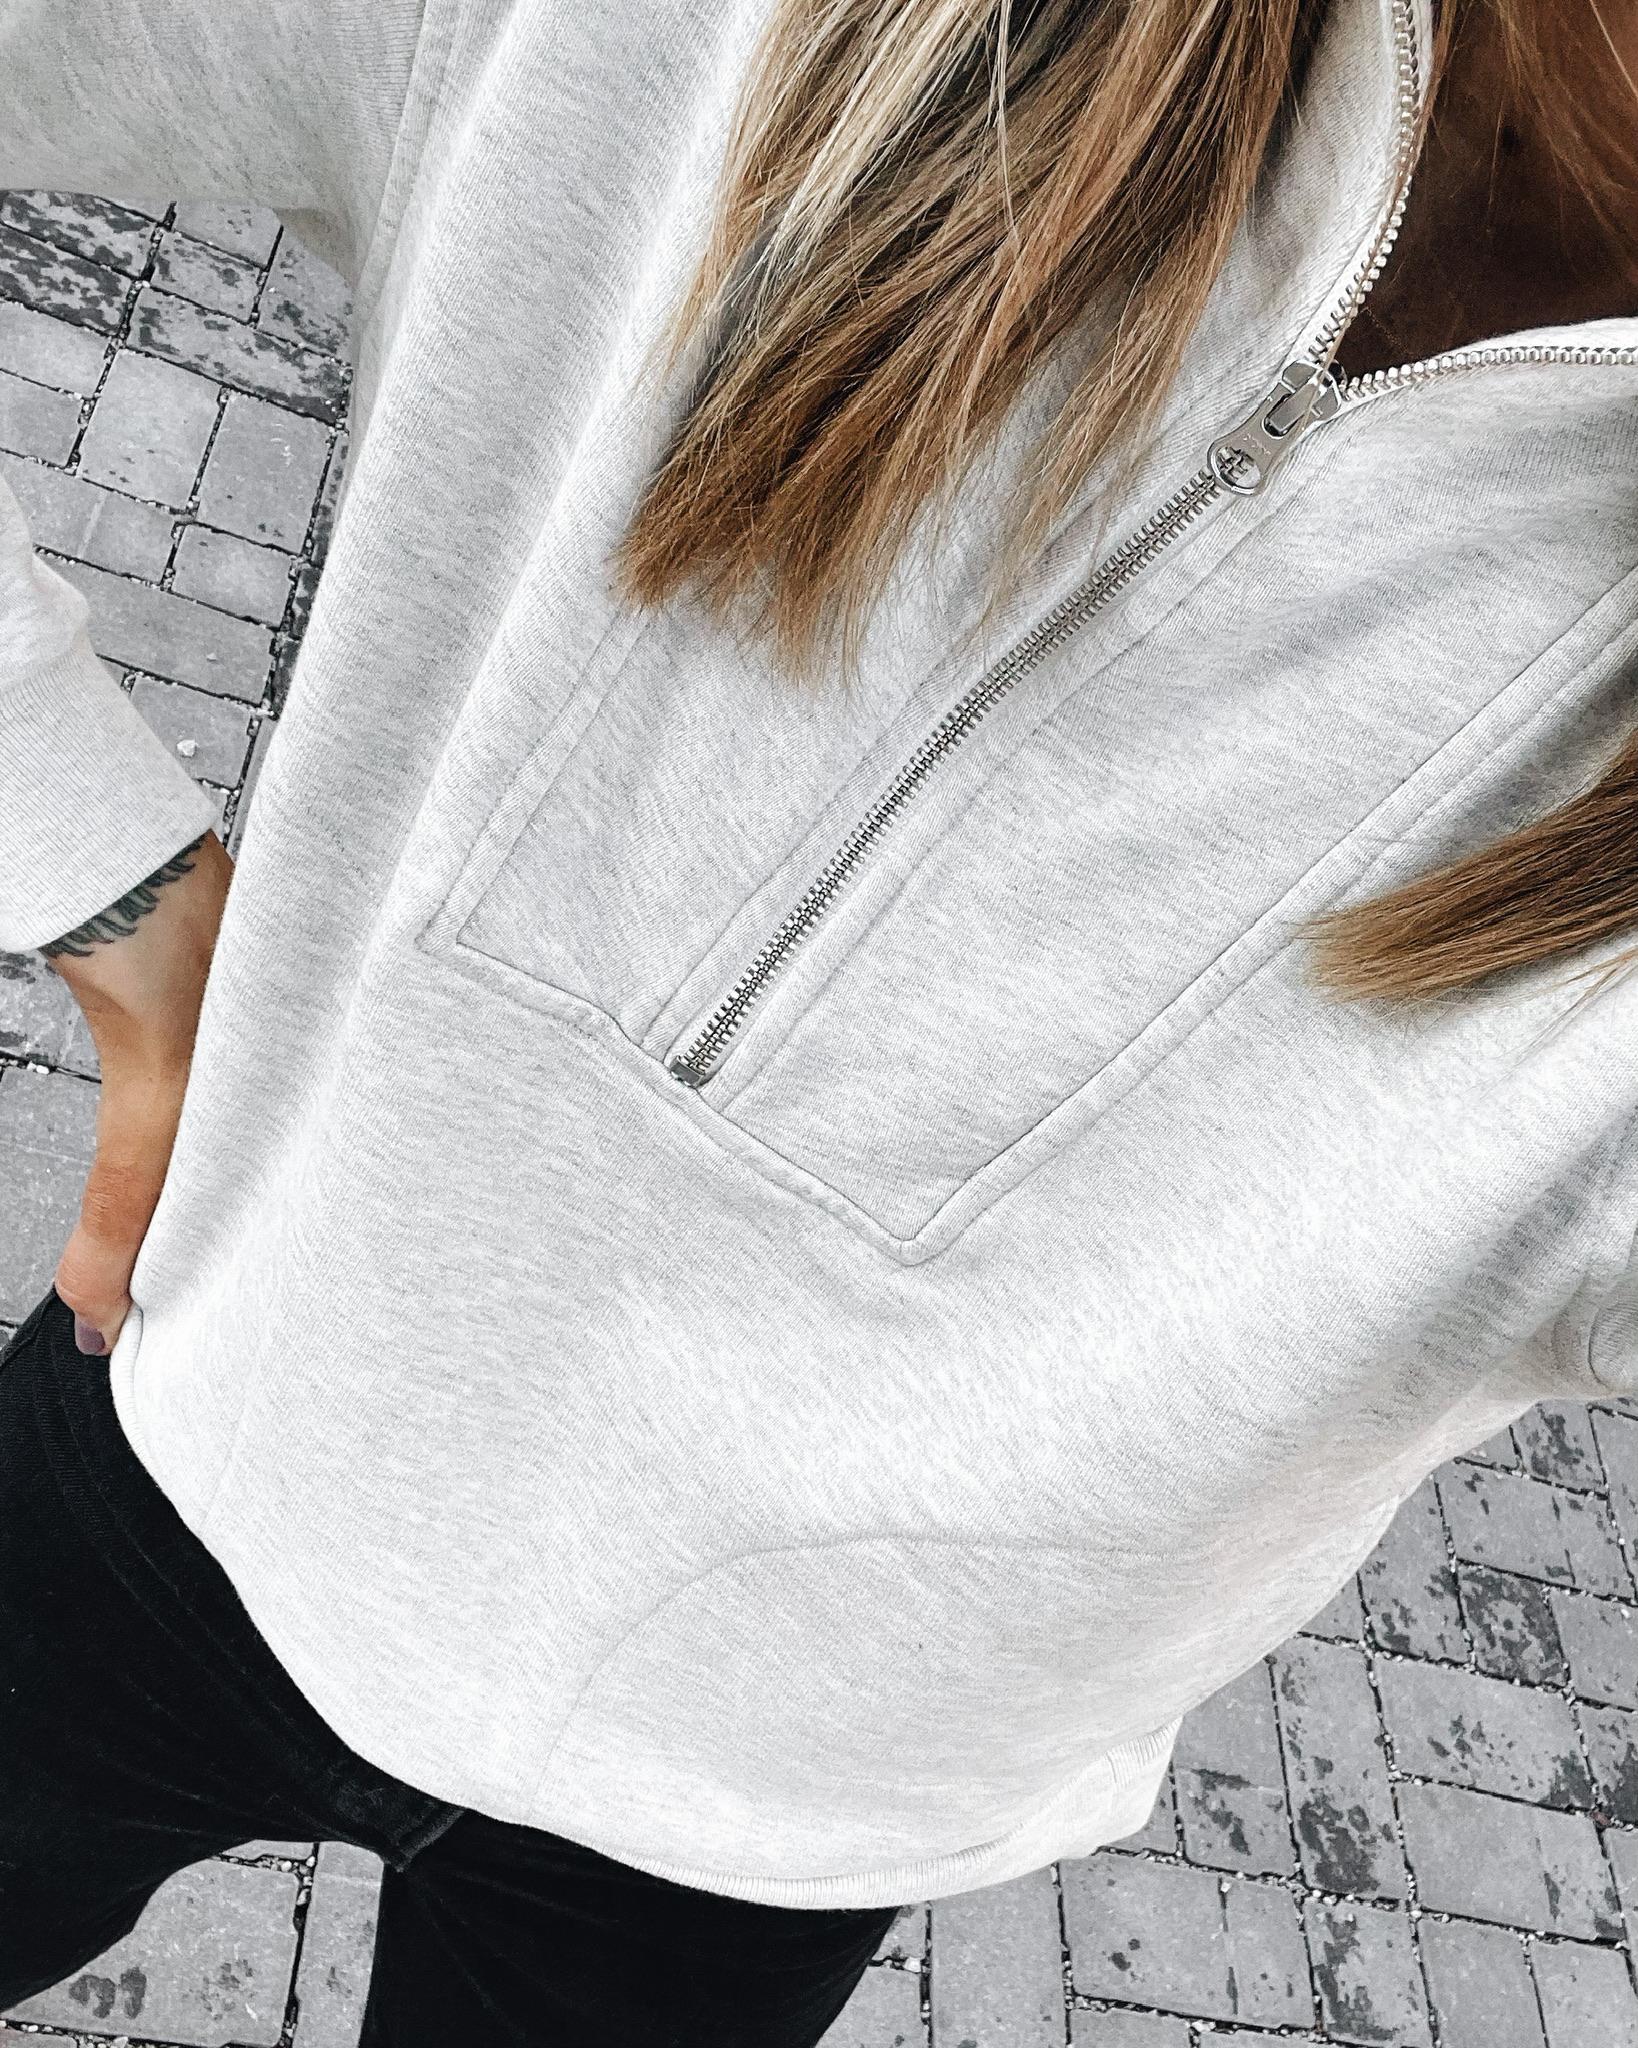 Fashion-Jackson-Wearing-Everlane-Half-Zip-Sweatshirt